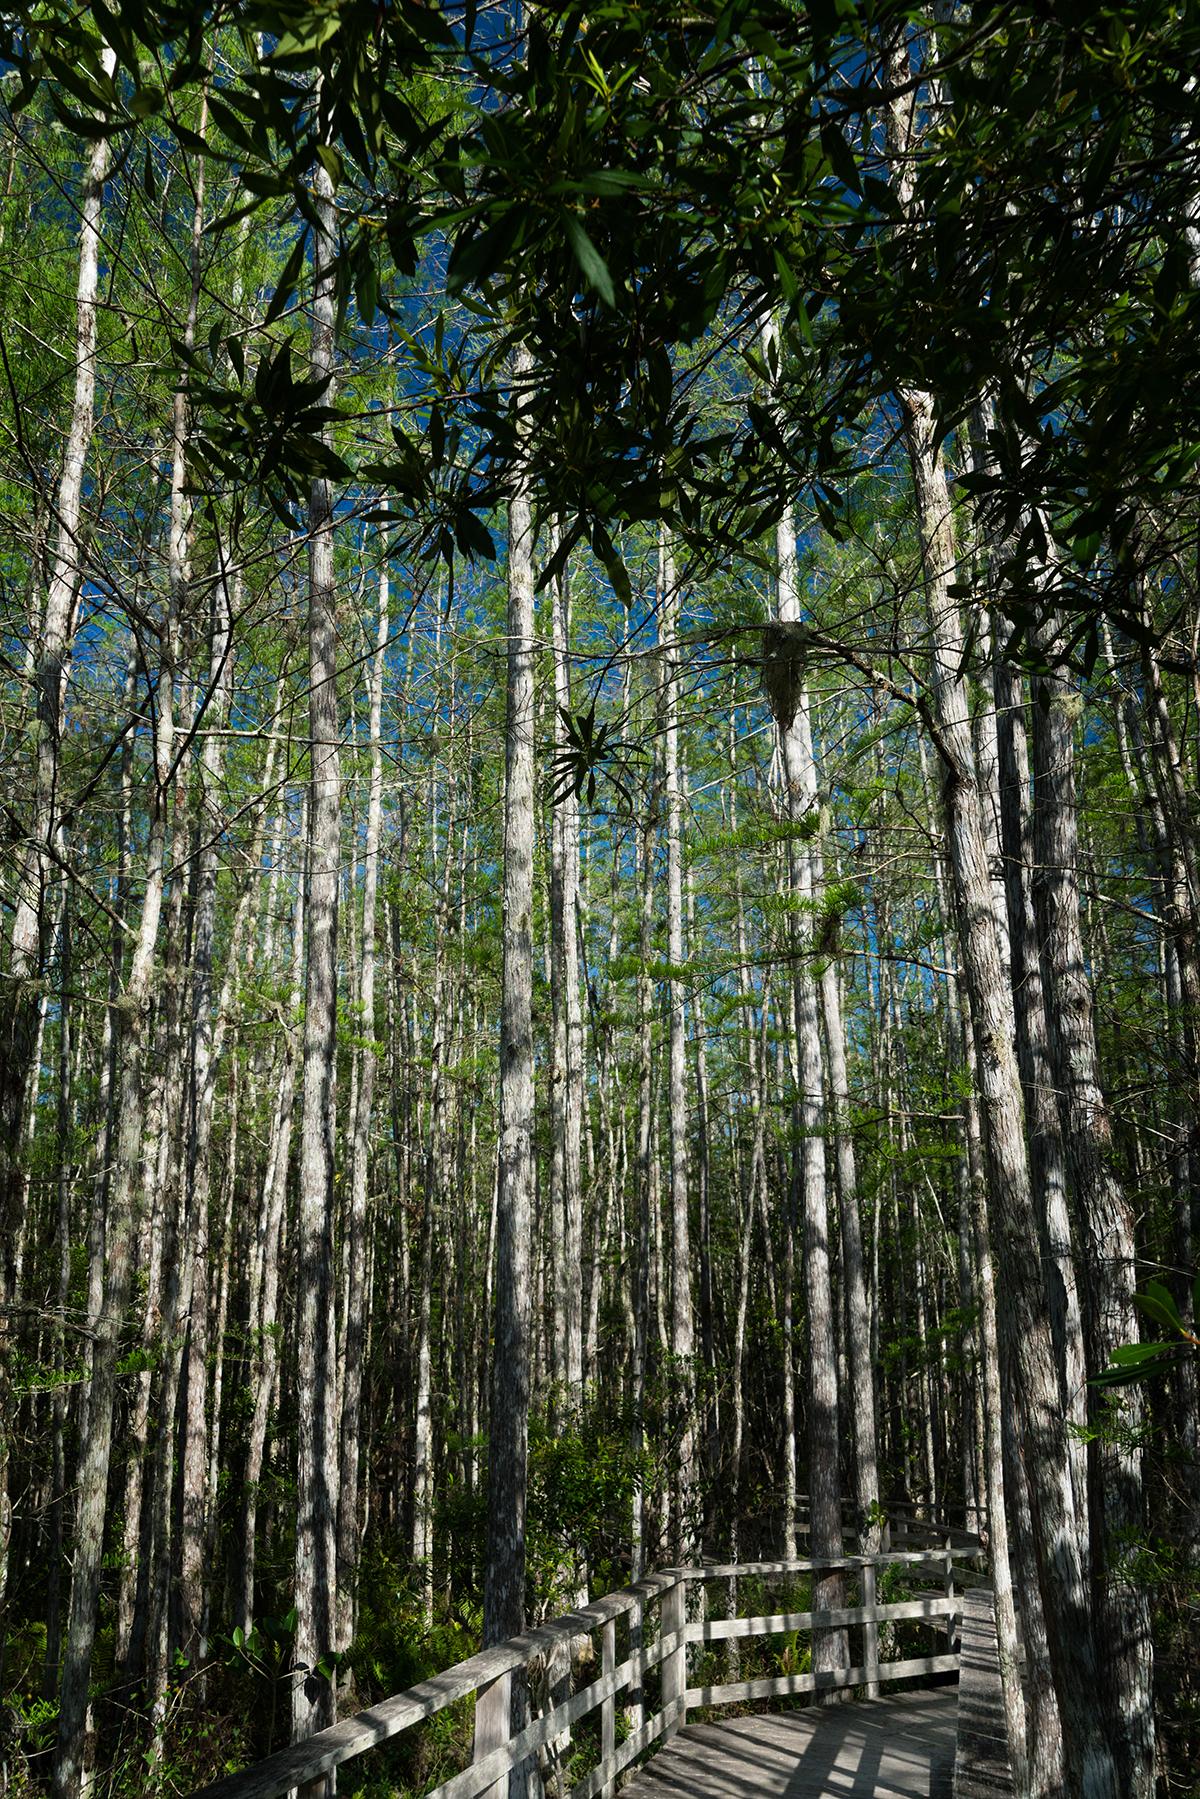 #corkscrew, #swamp, #santuary, #naples, #florida, #nature, #birdwatching, #vertical, #sony